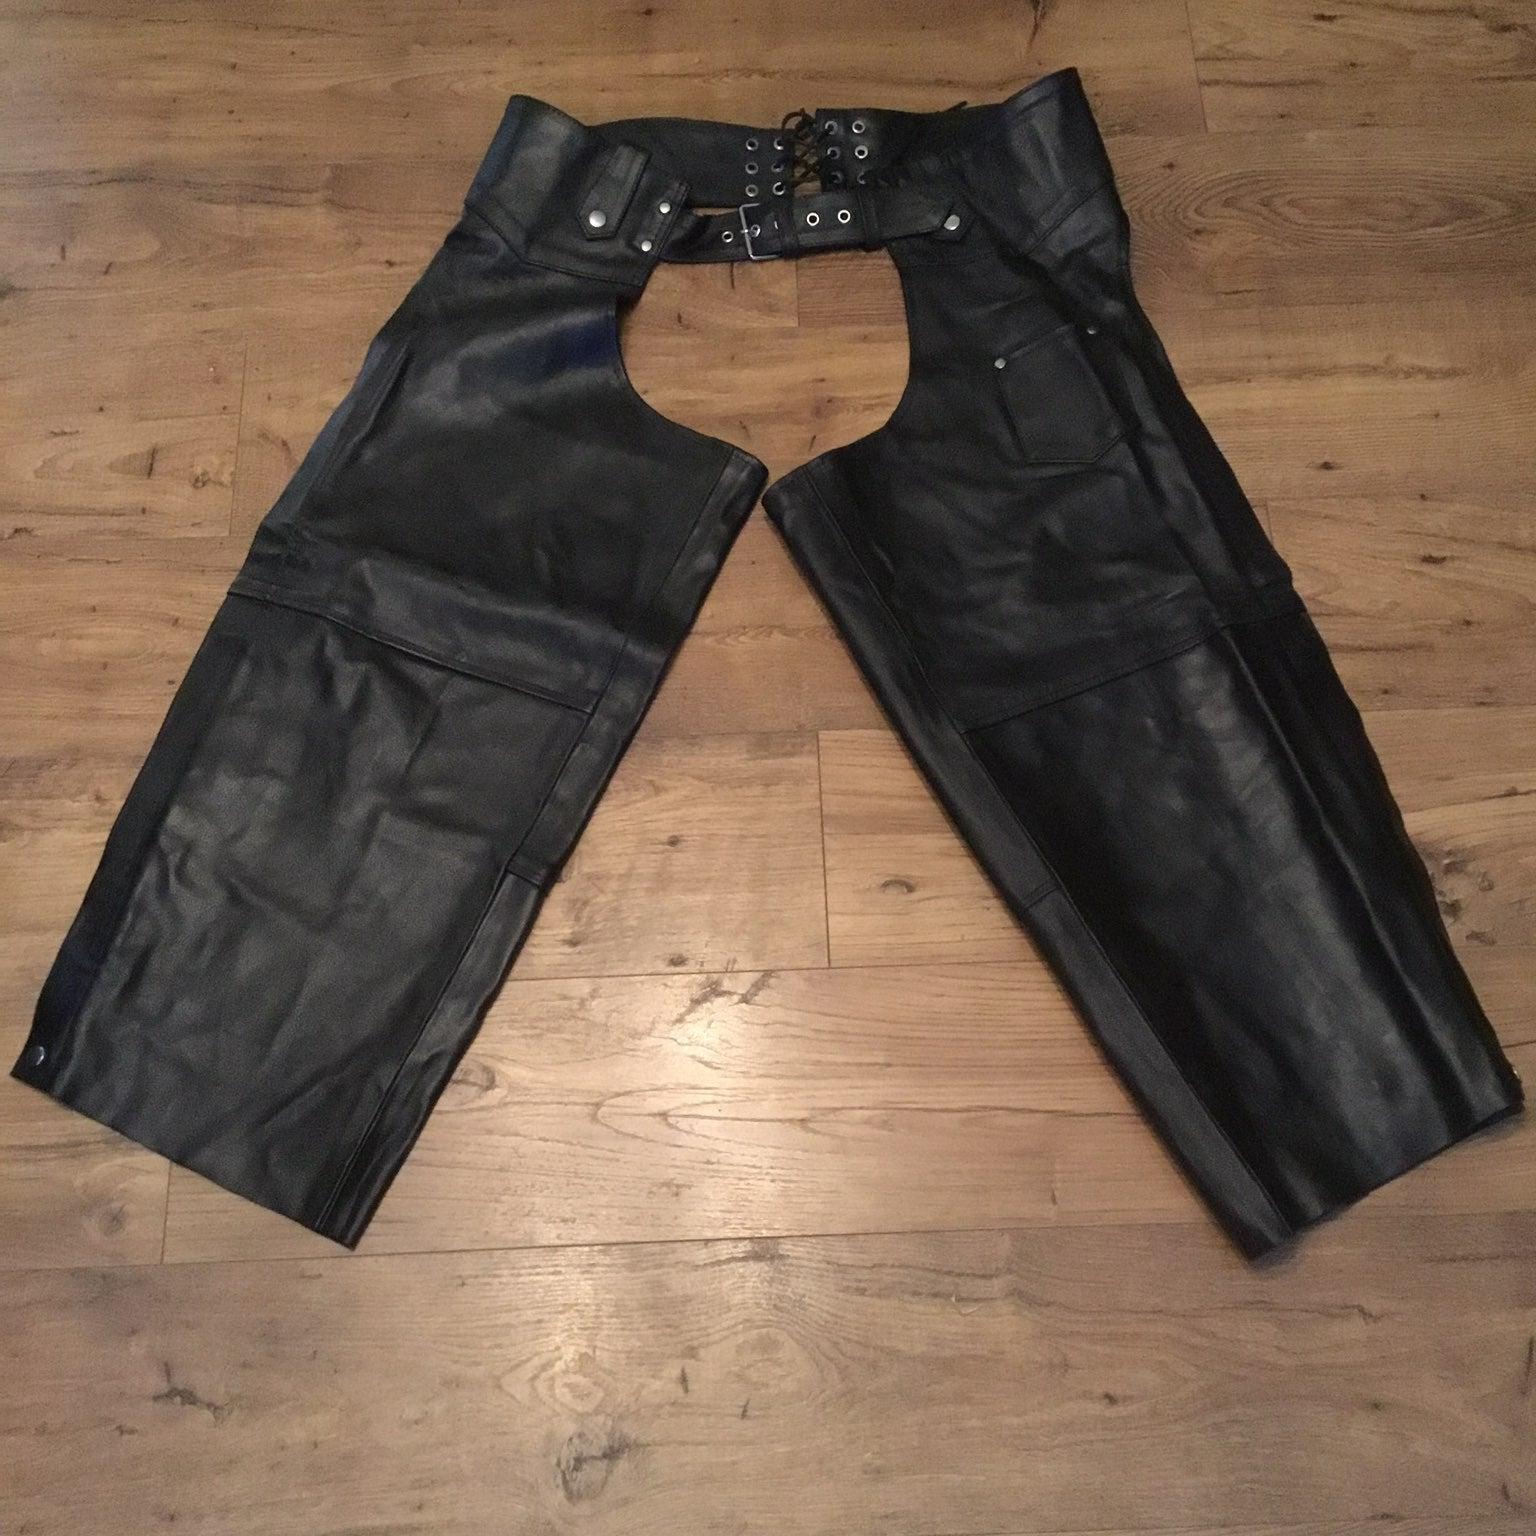 Allstate Genuine Leather Unisex Chaps